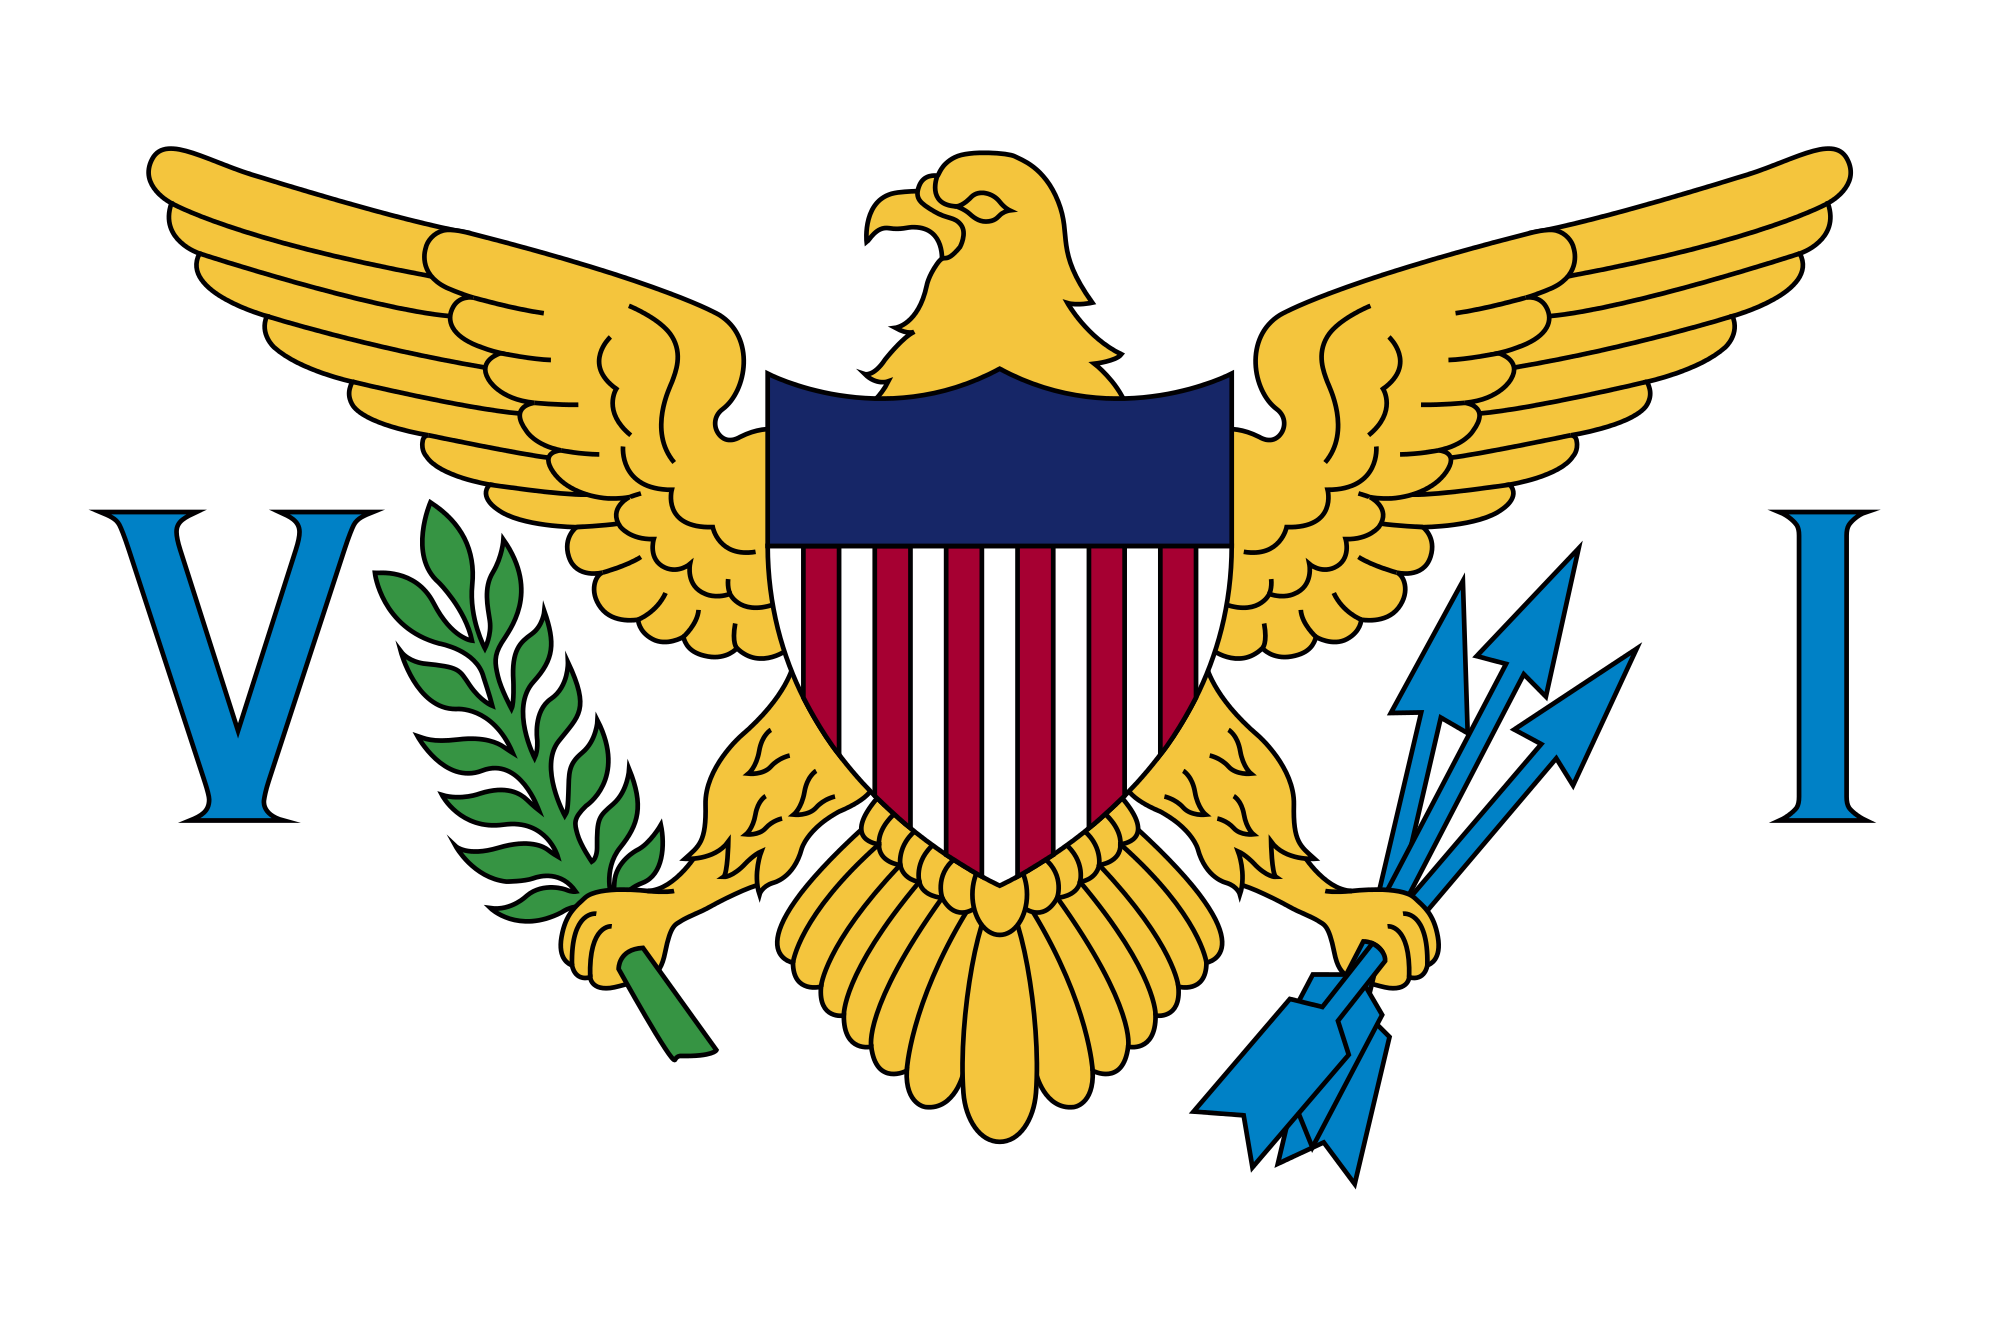 अमेरिका वर्जिन द्वीप समूह, देश, emblema, लोग�प्रतीकbolo - HD वॉलपेपर - प्रोफेसर-falken.com